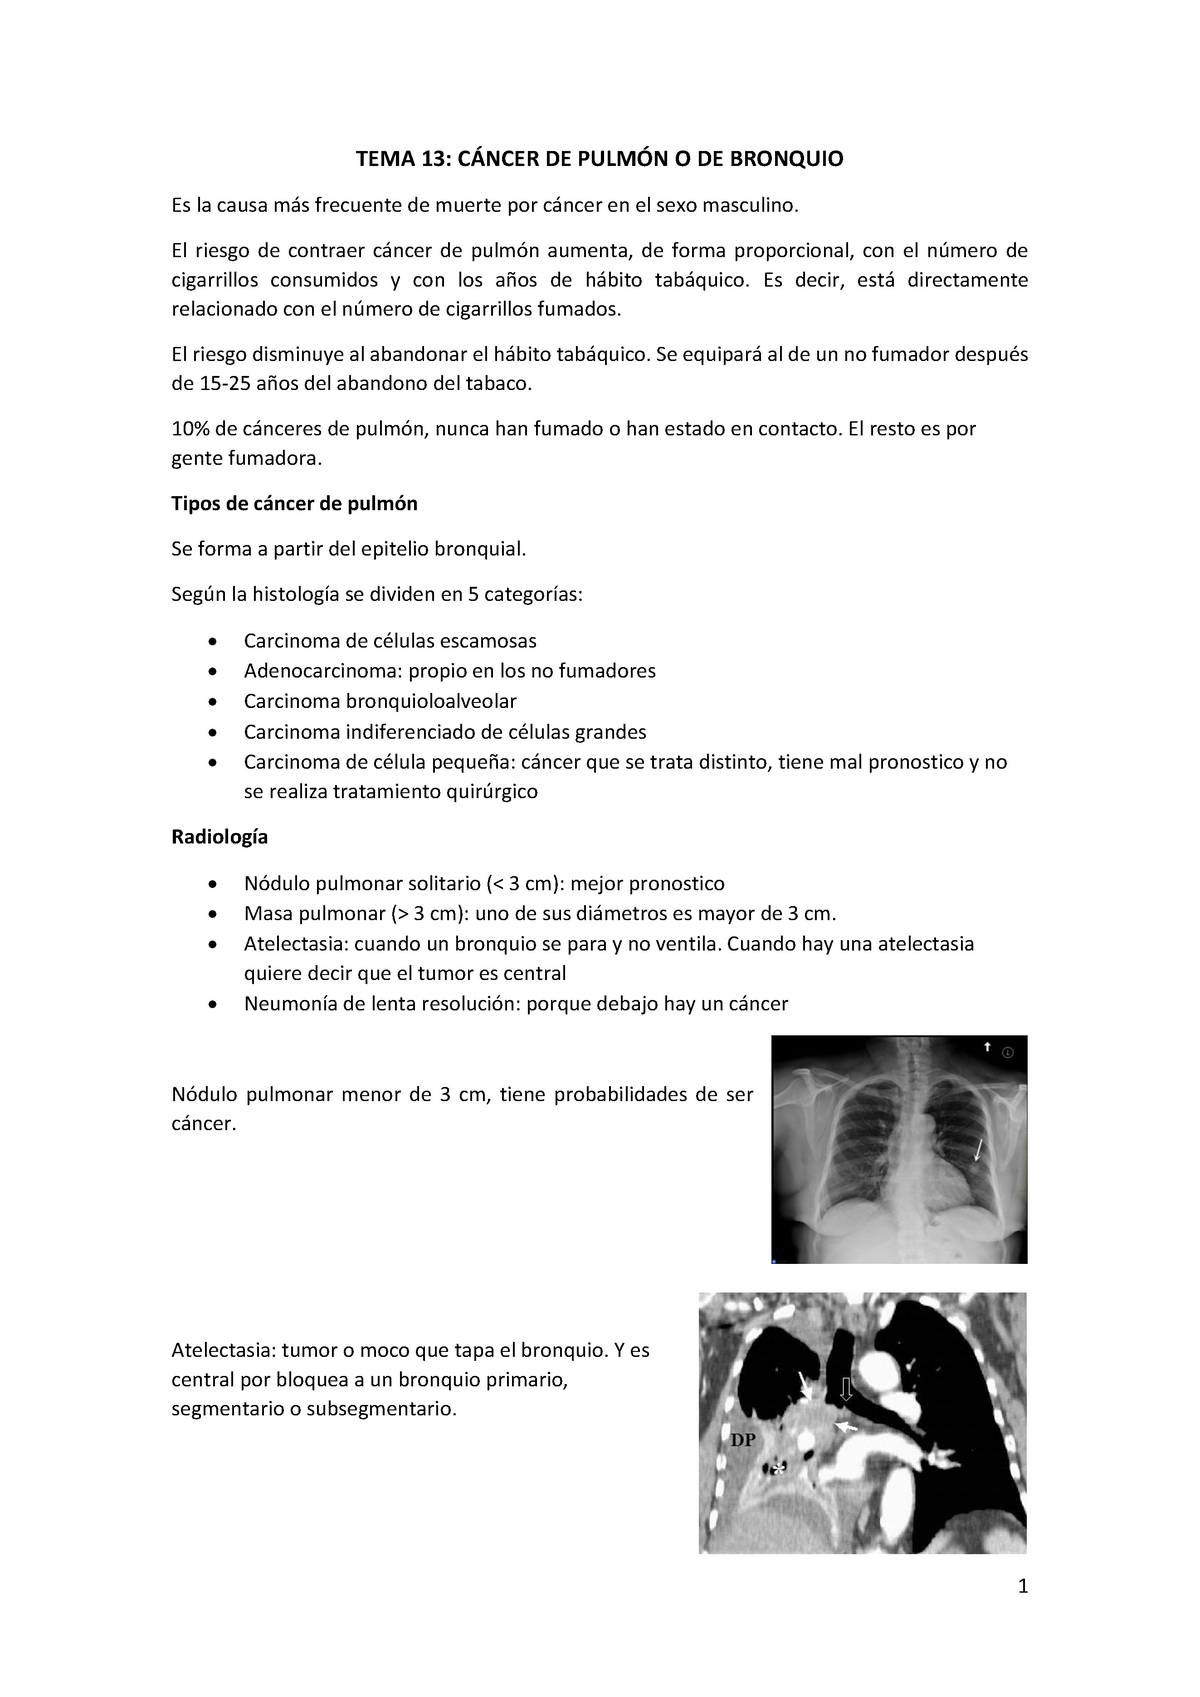 human papilloma virus outbreak papiloma boca tratamiento